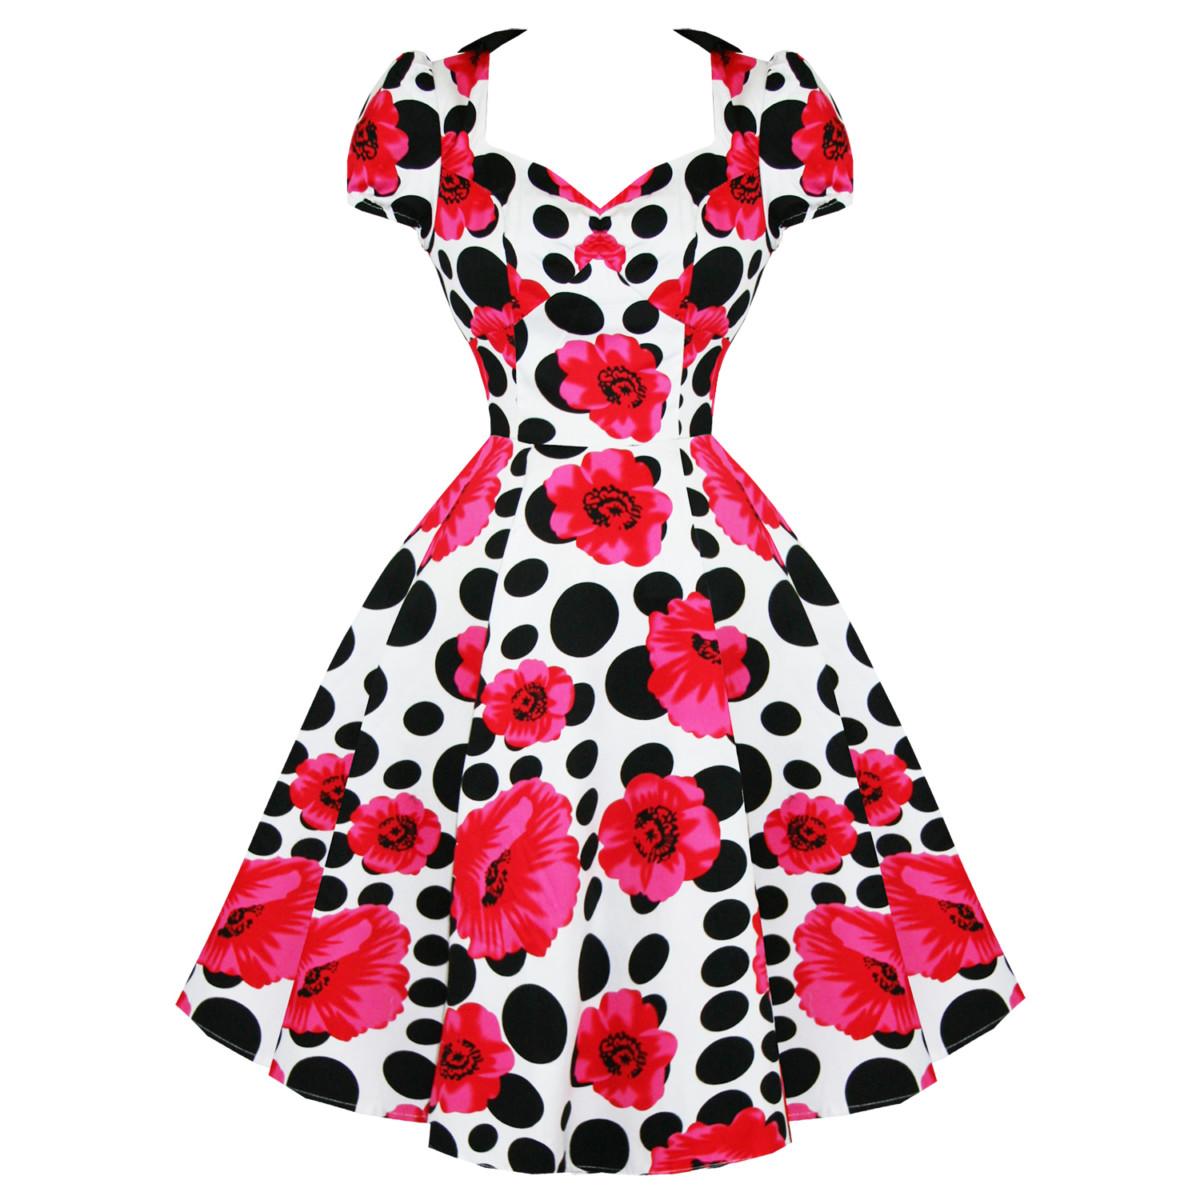 Vintage Année 50 dedans robe annee 50 - topiwall